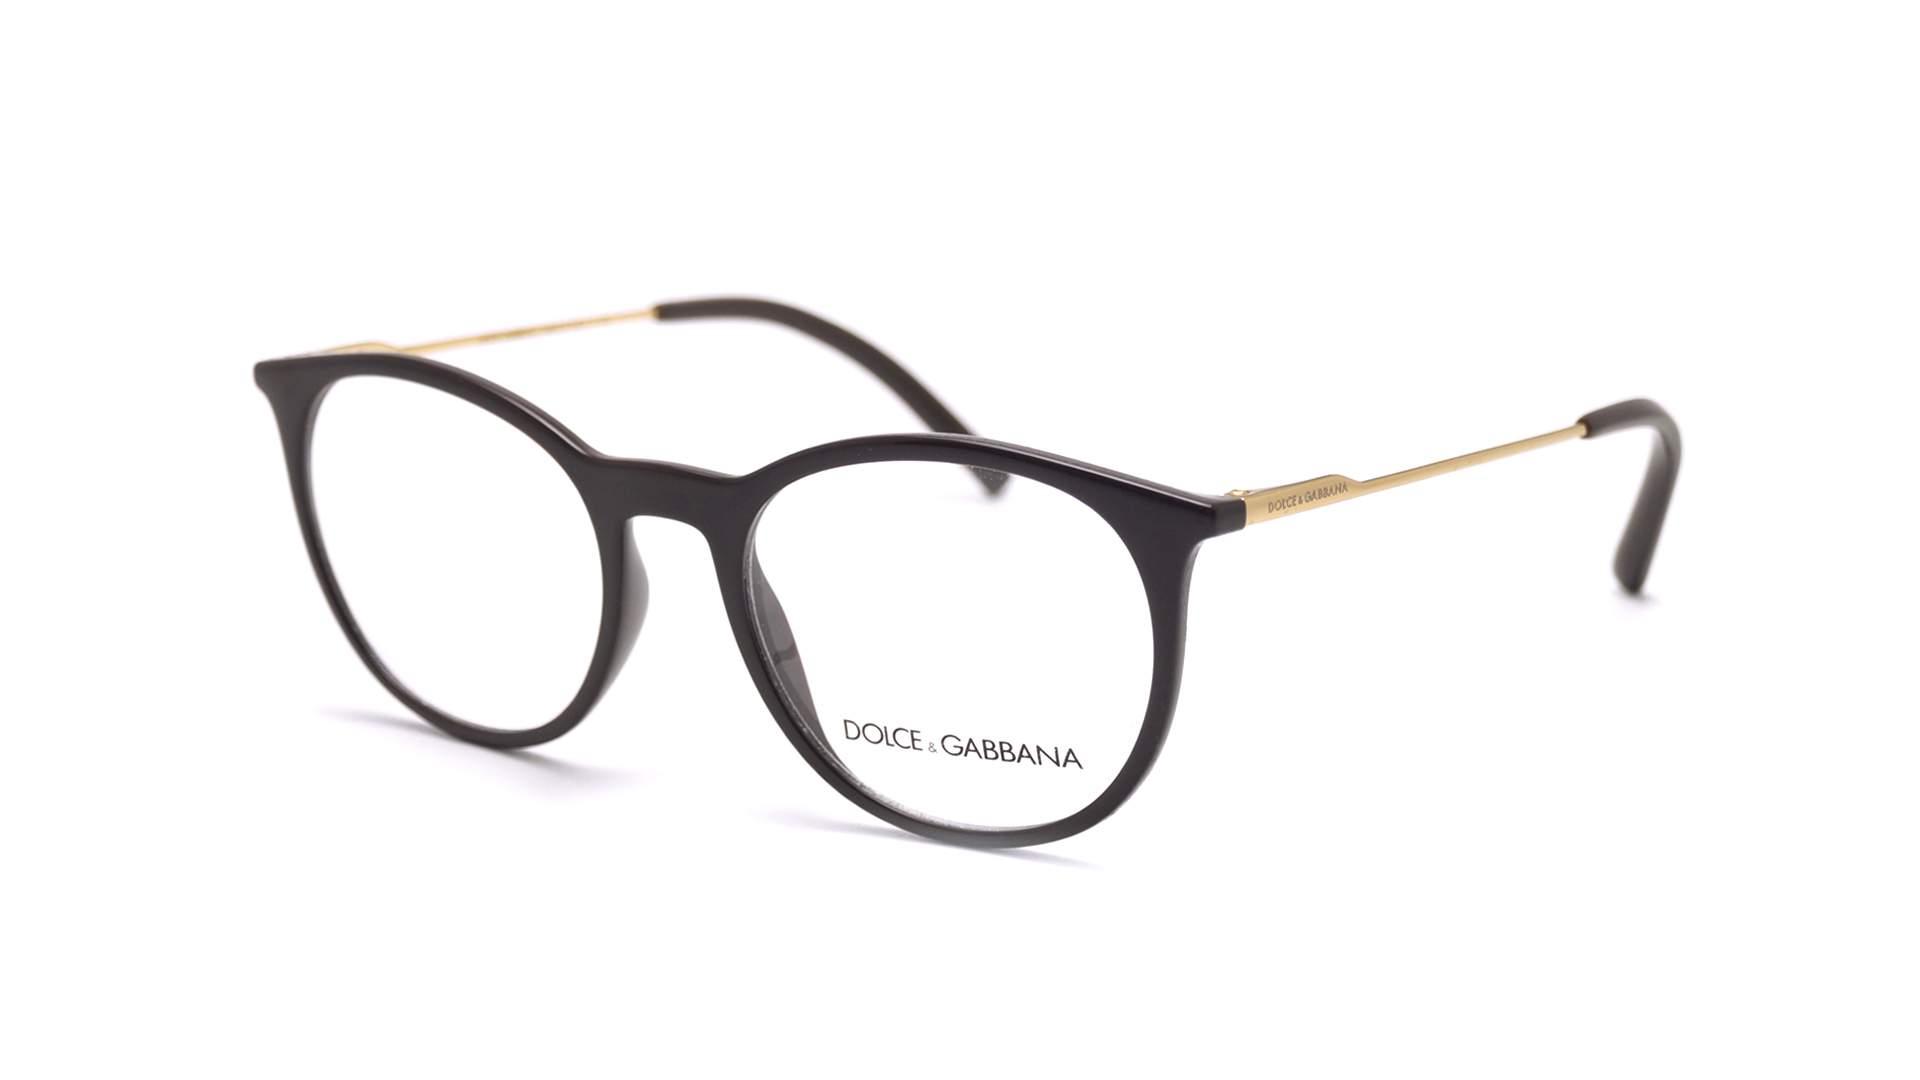 Gabbana 3042 90 BrunPrix Dolceamp; Dg5031 18 Visiofactory 49 € 129 thrQCxsd